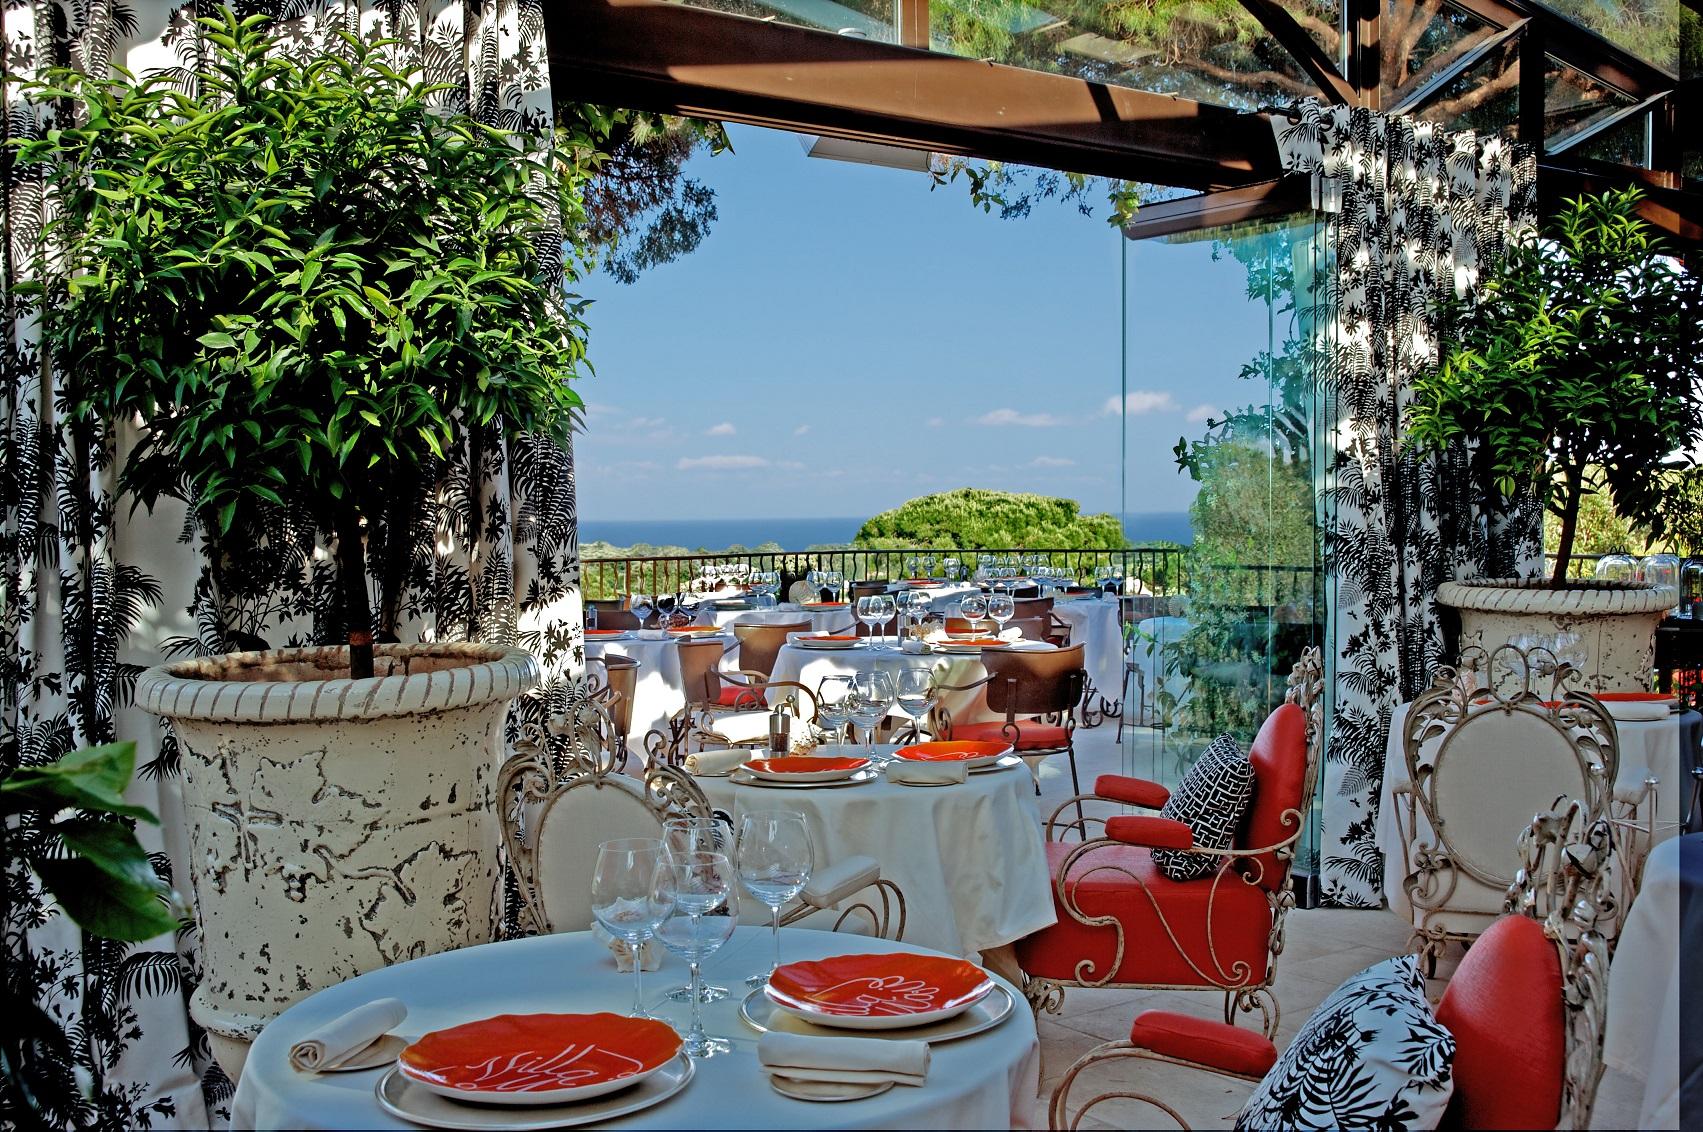 Hotel Villa Marie In Ramatuelle St Tropez France White